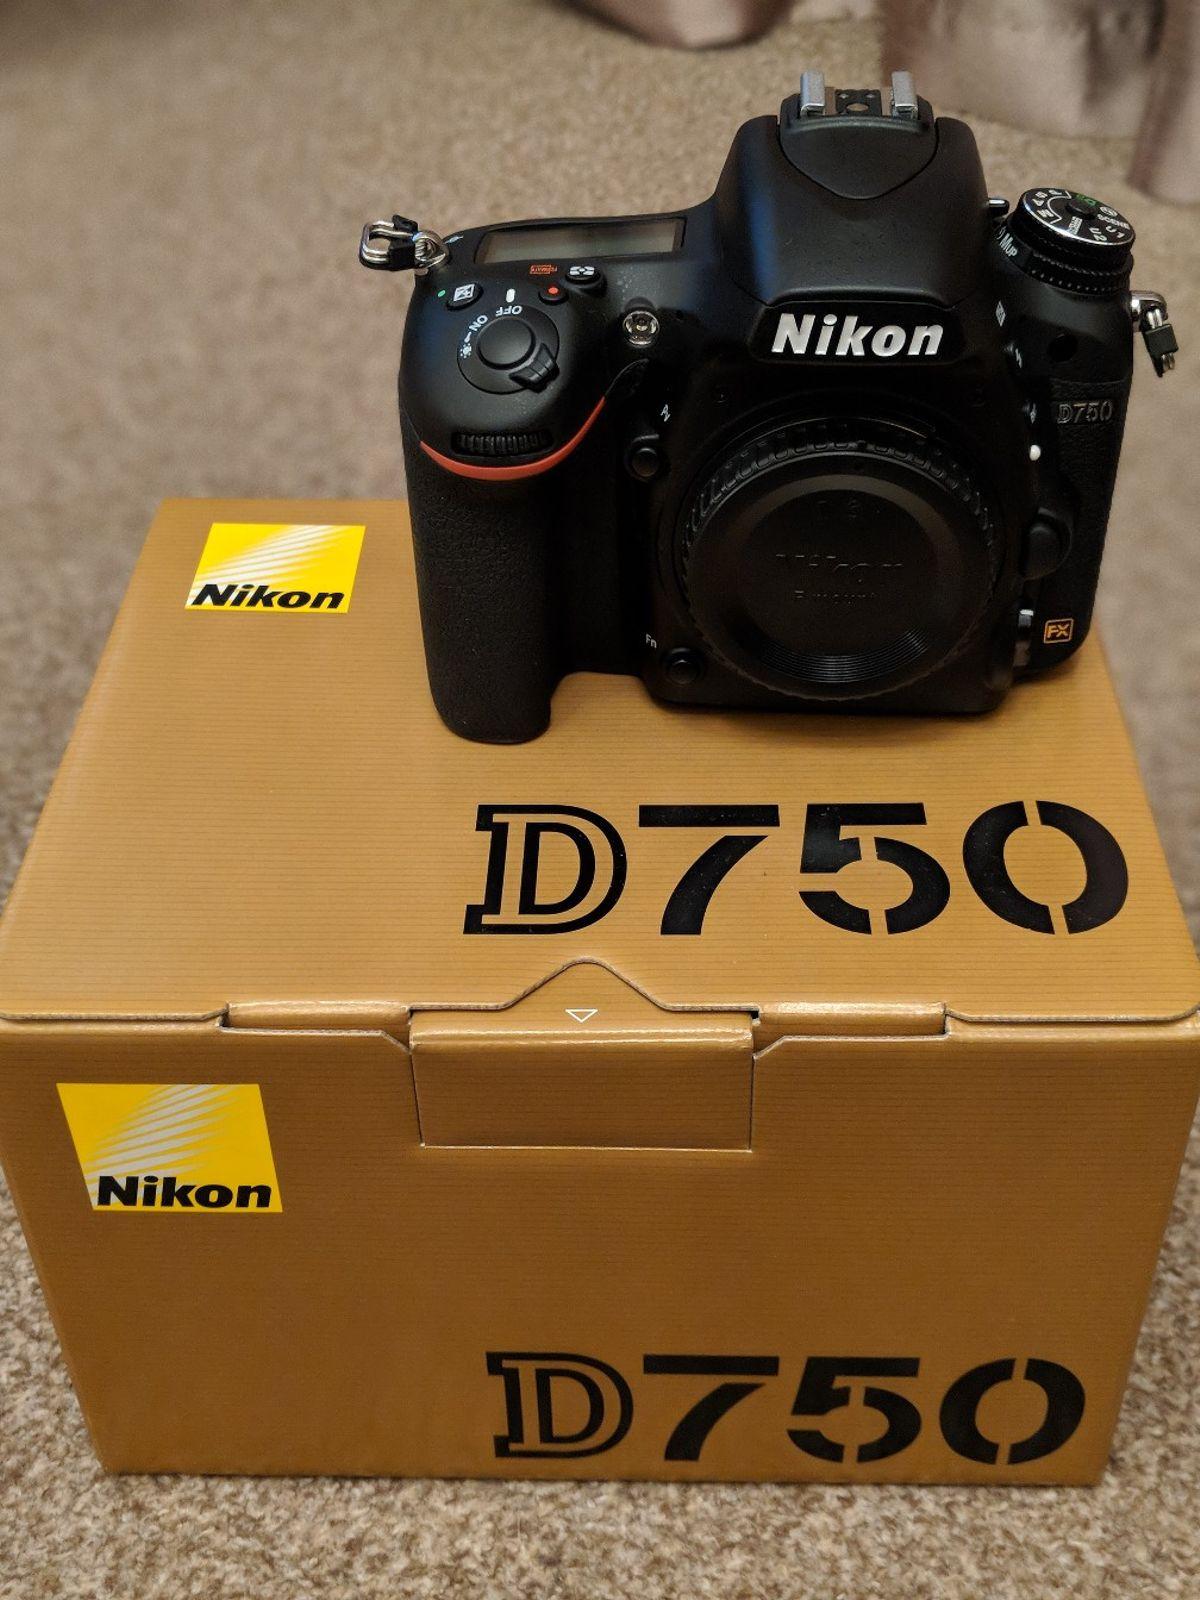 Nikon D750 preused camera